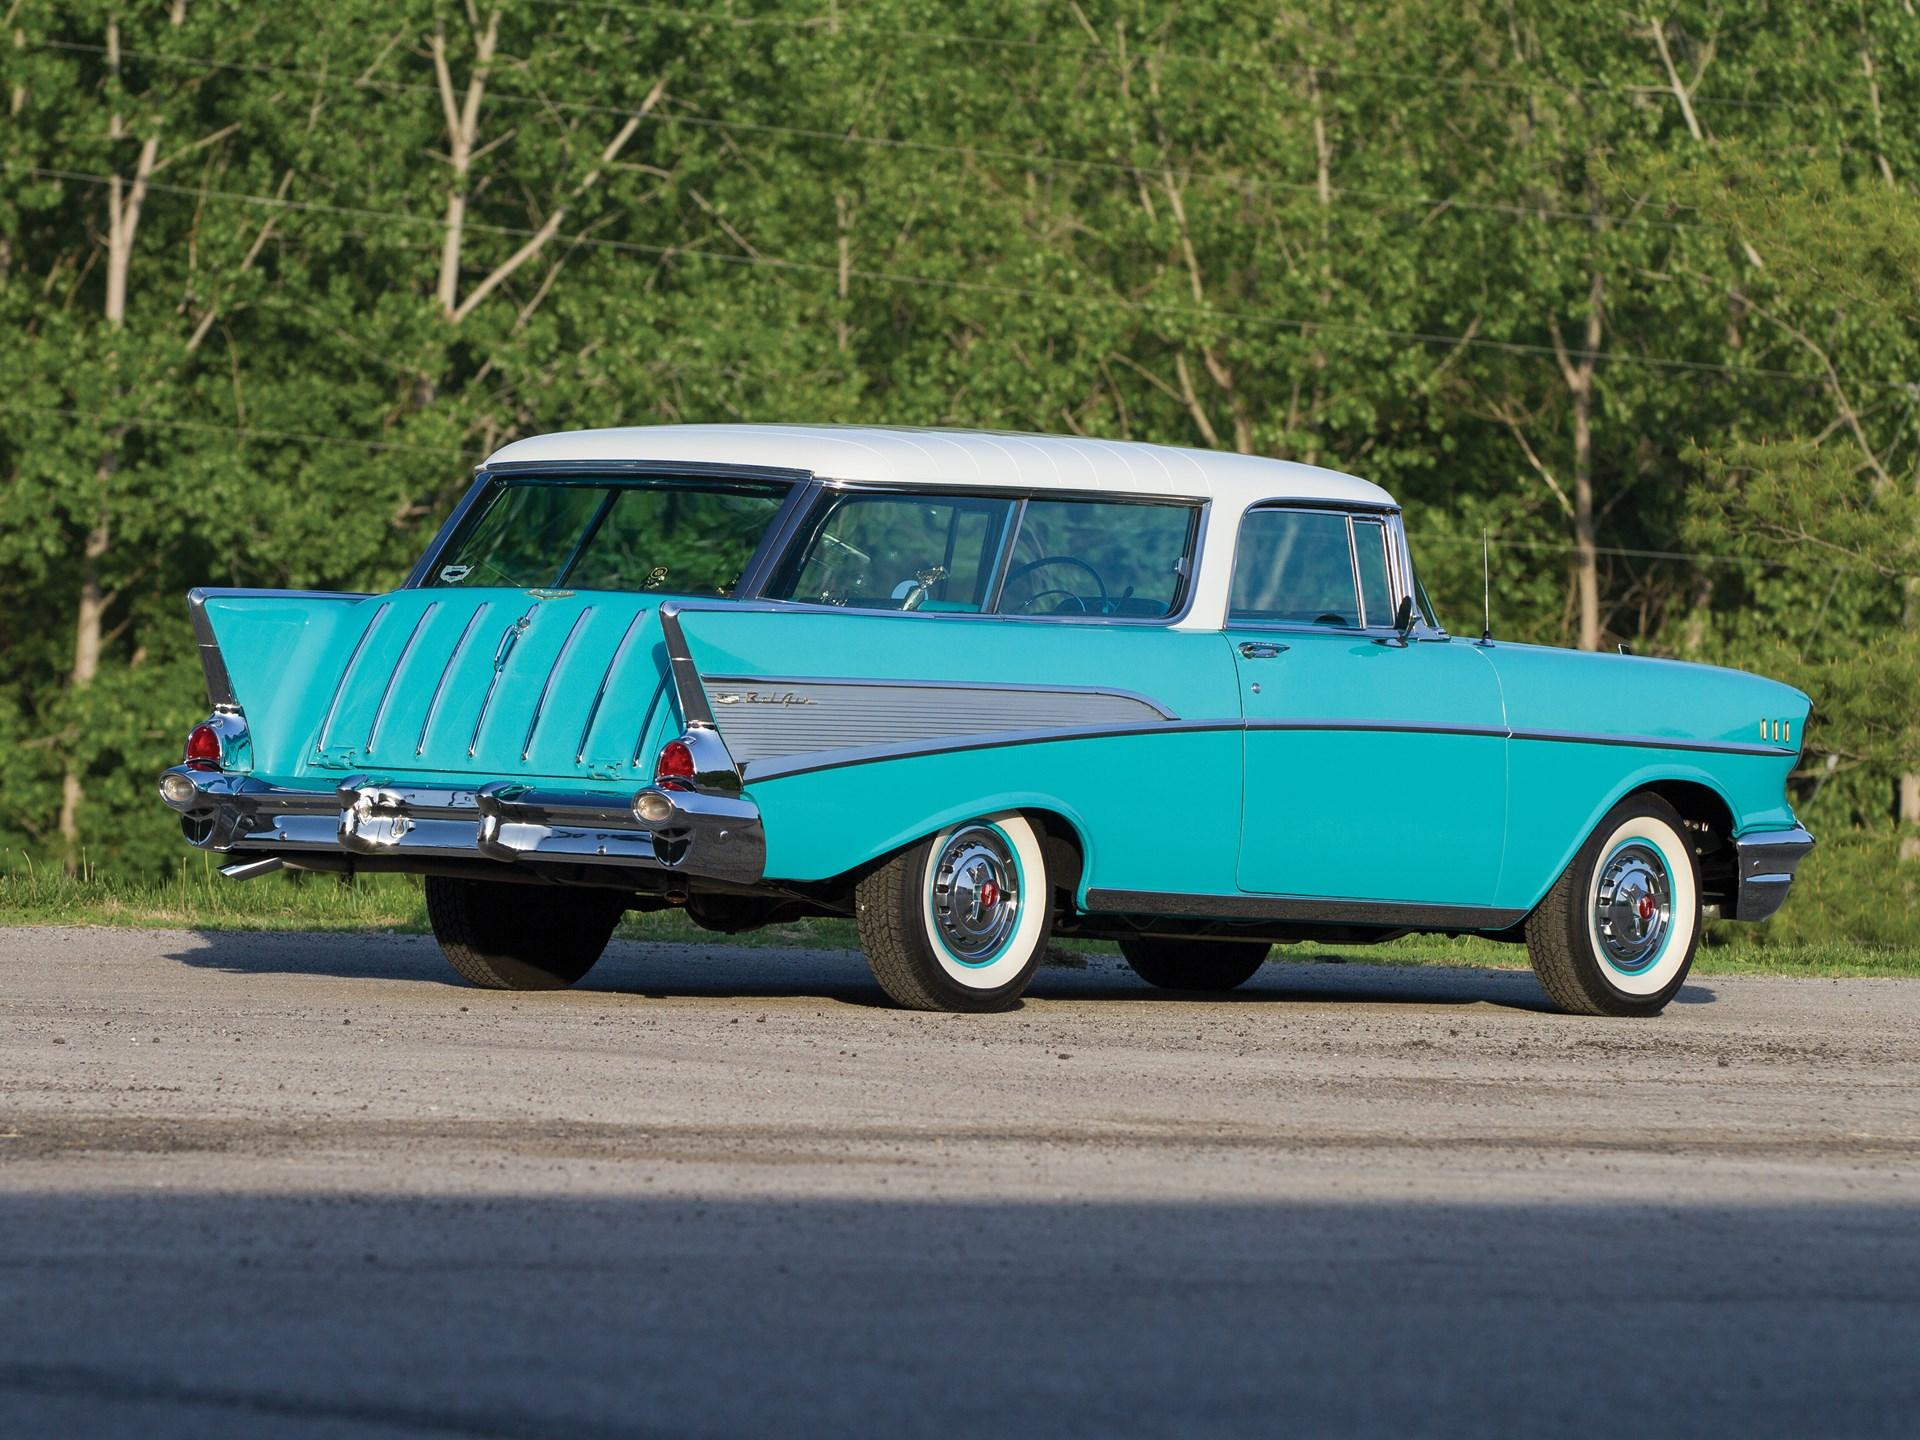 1957 Chevrolet Bel Air Nomad 3/4 rear